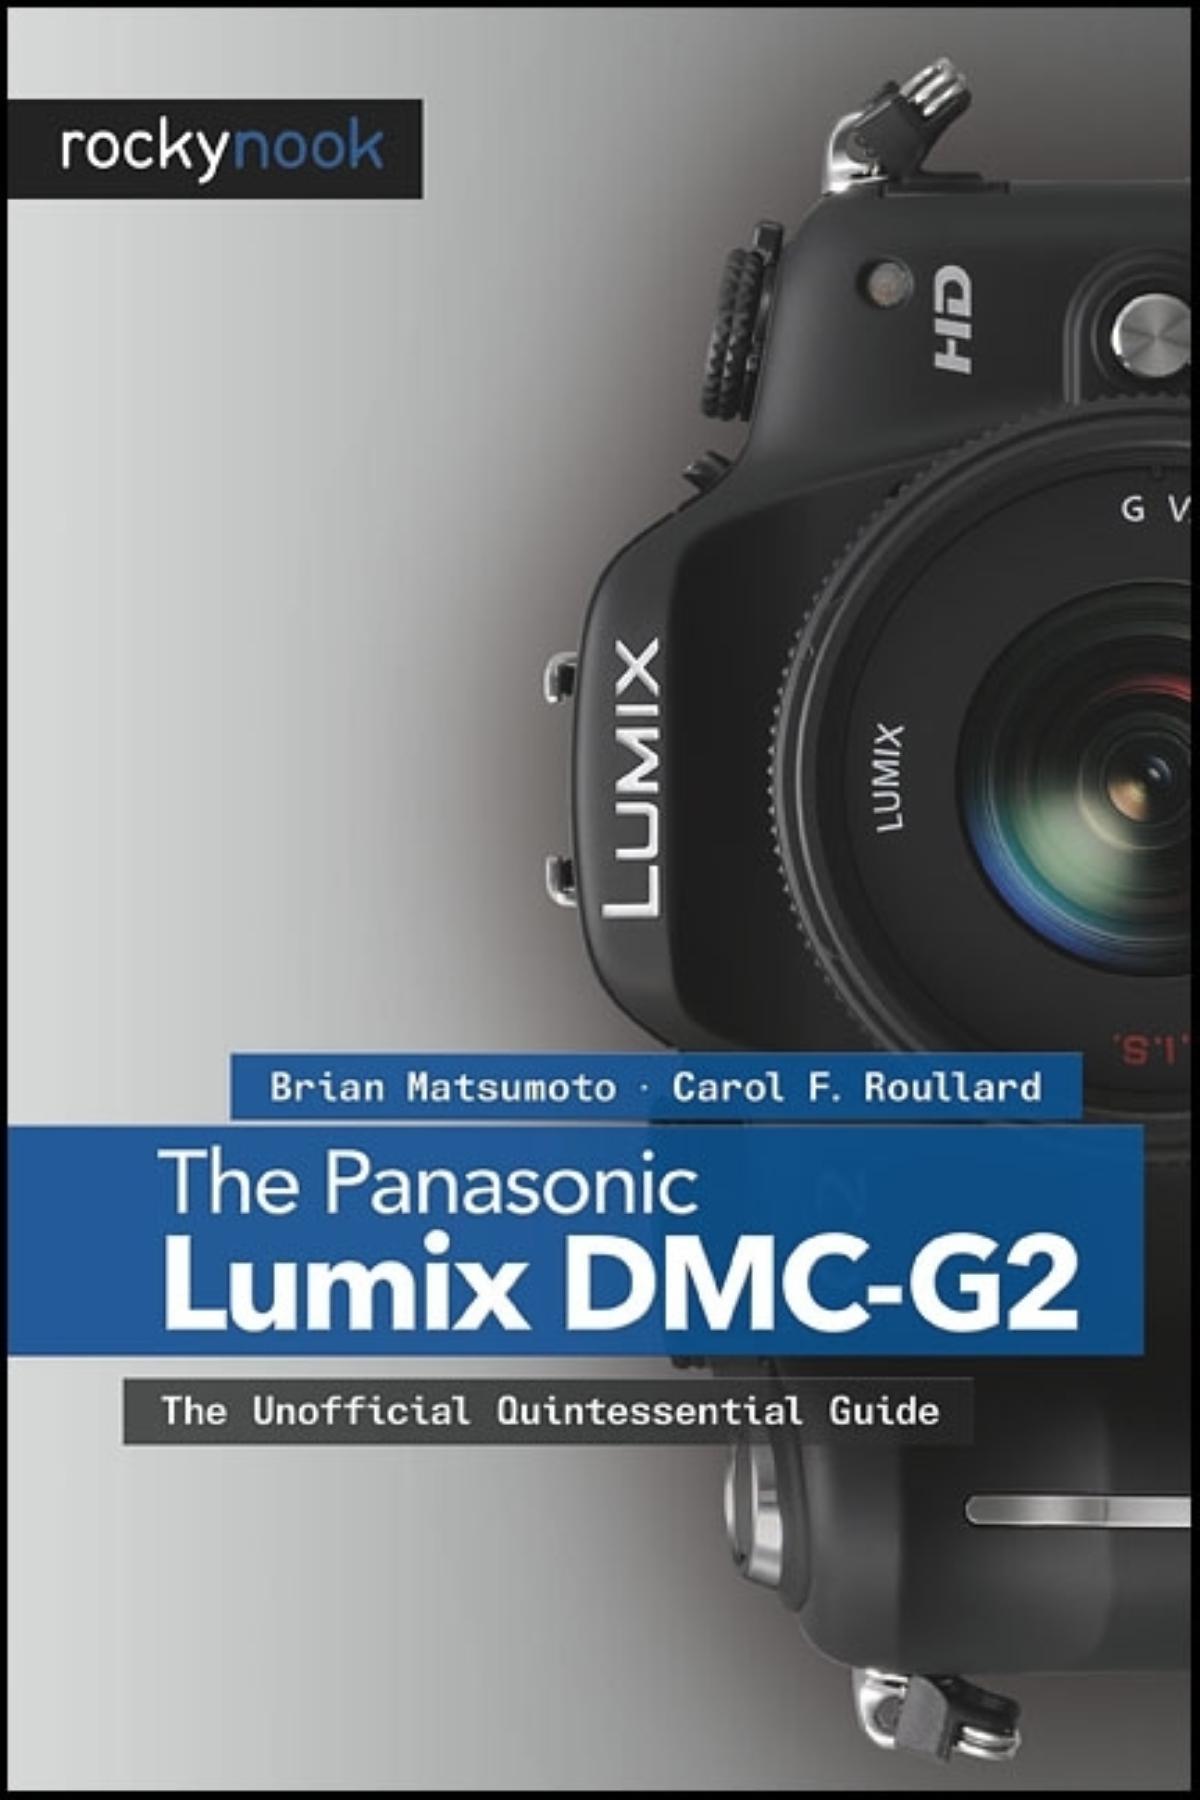 the panasonic lumix dmc g2 rockynook rh rockynook com lumix dmc-g2 user guide Lumix G5